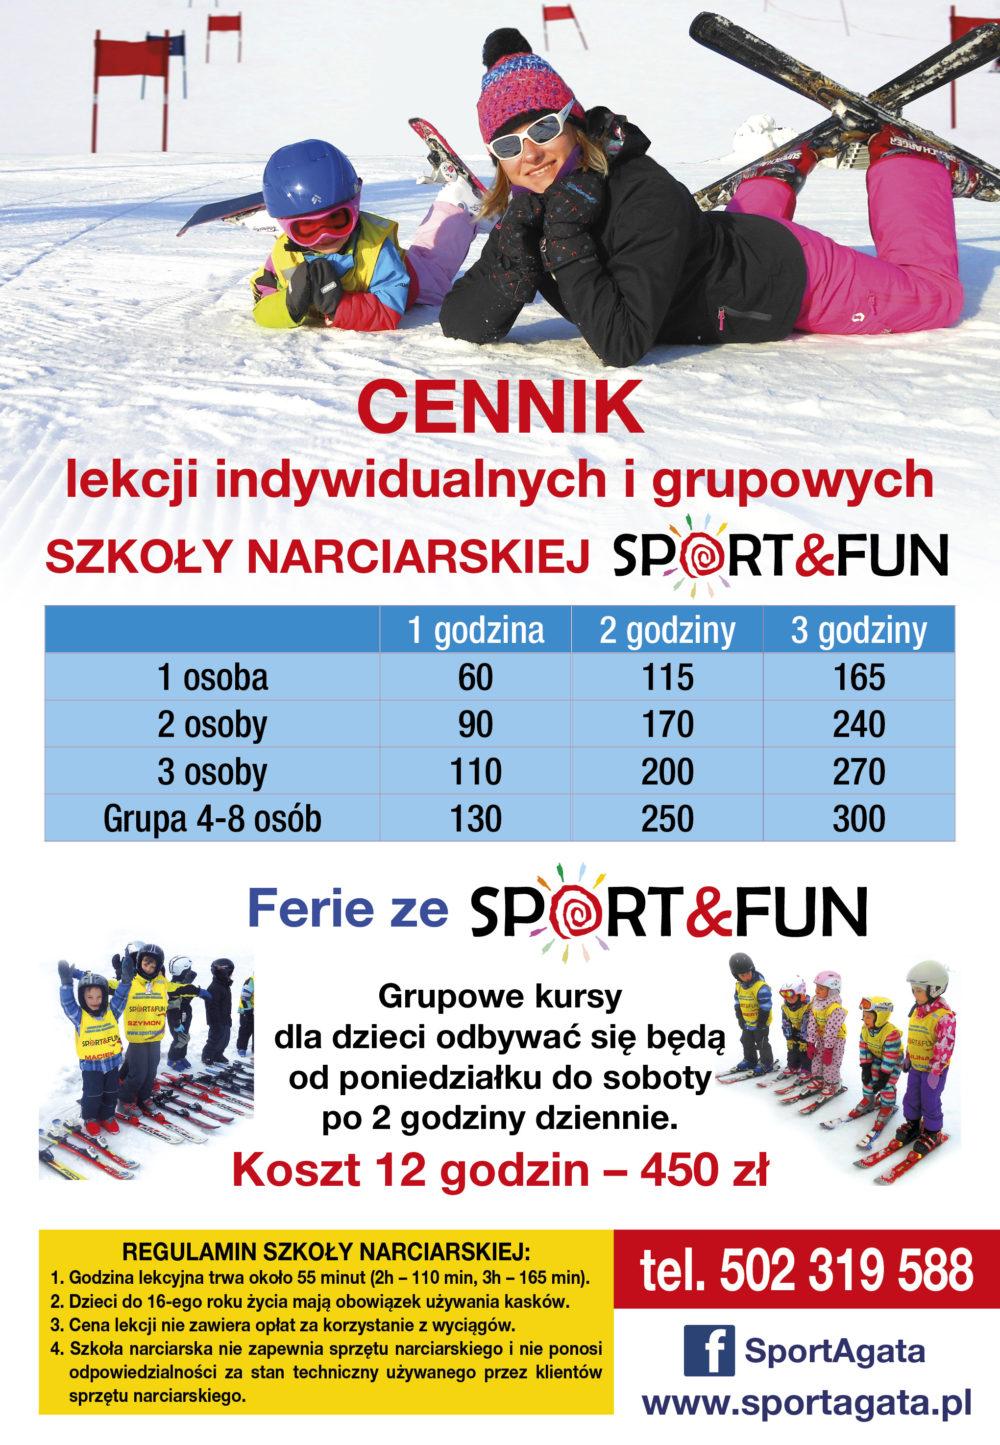 cennik-tablica-54-x-78-cm